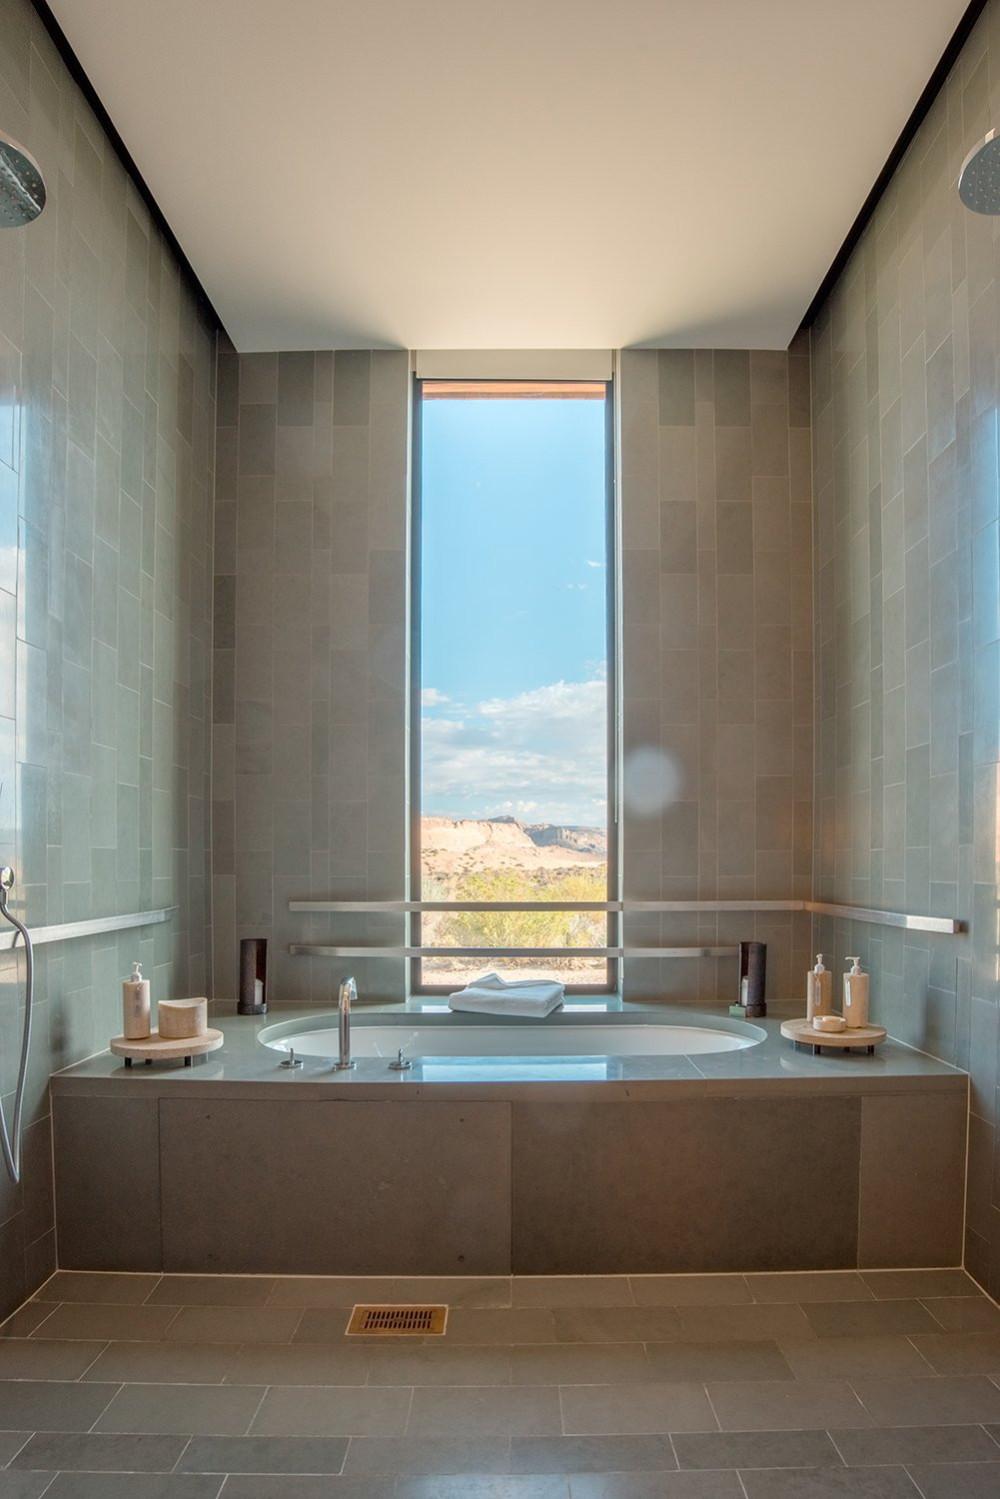 美国阿曼吉里(Amangiri)度假酒店_great-bath-and-shower.jpg